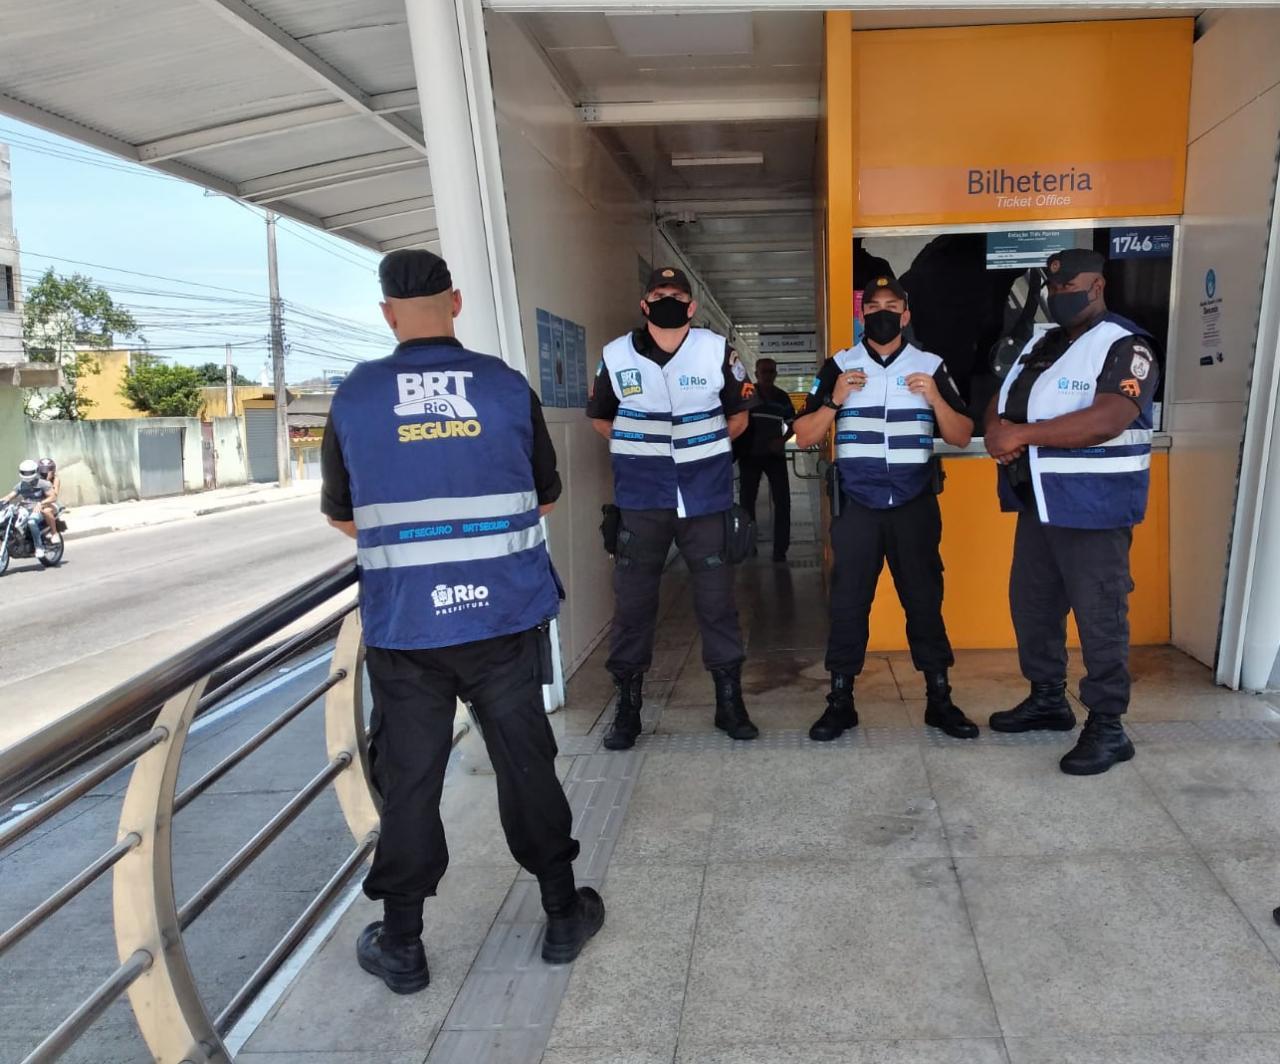 Agentes do programa BRT Seguro